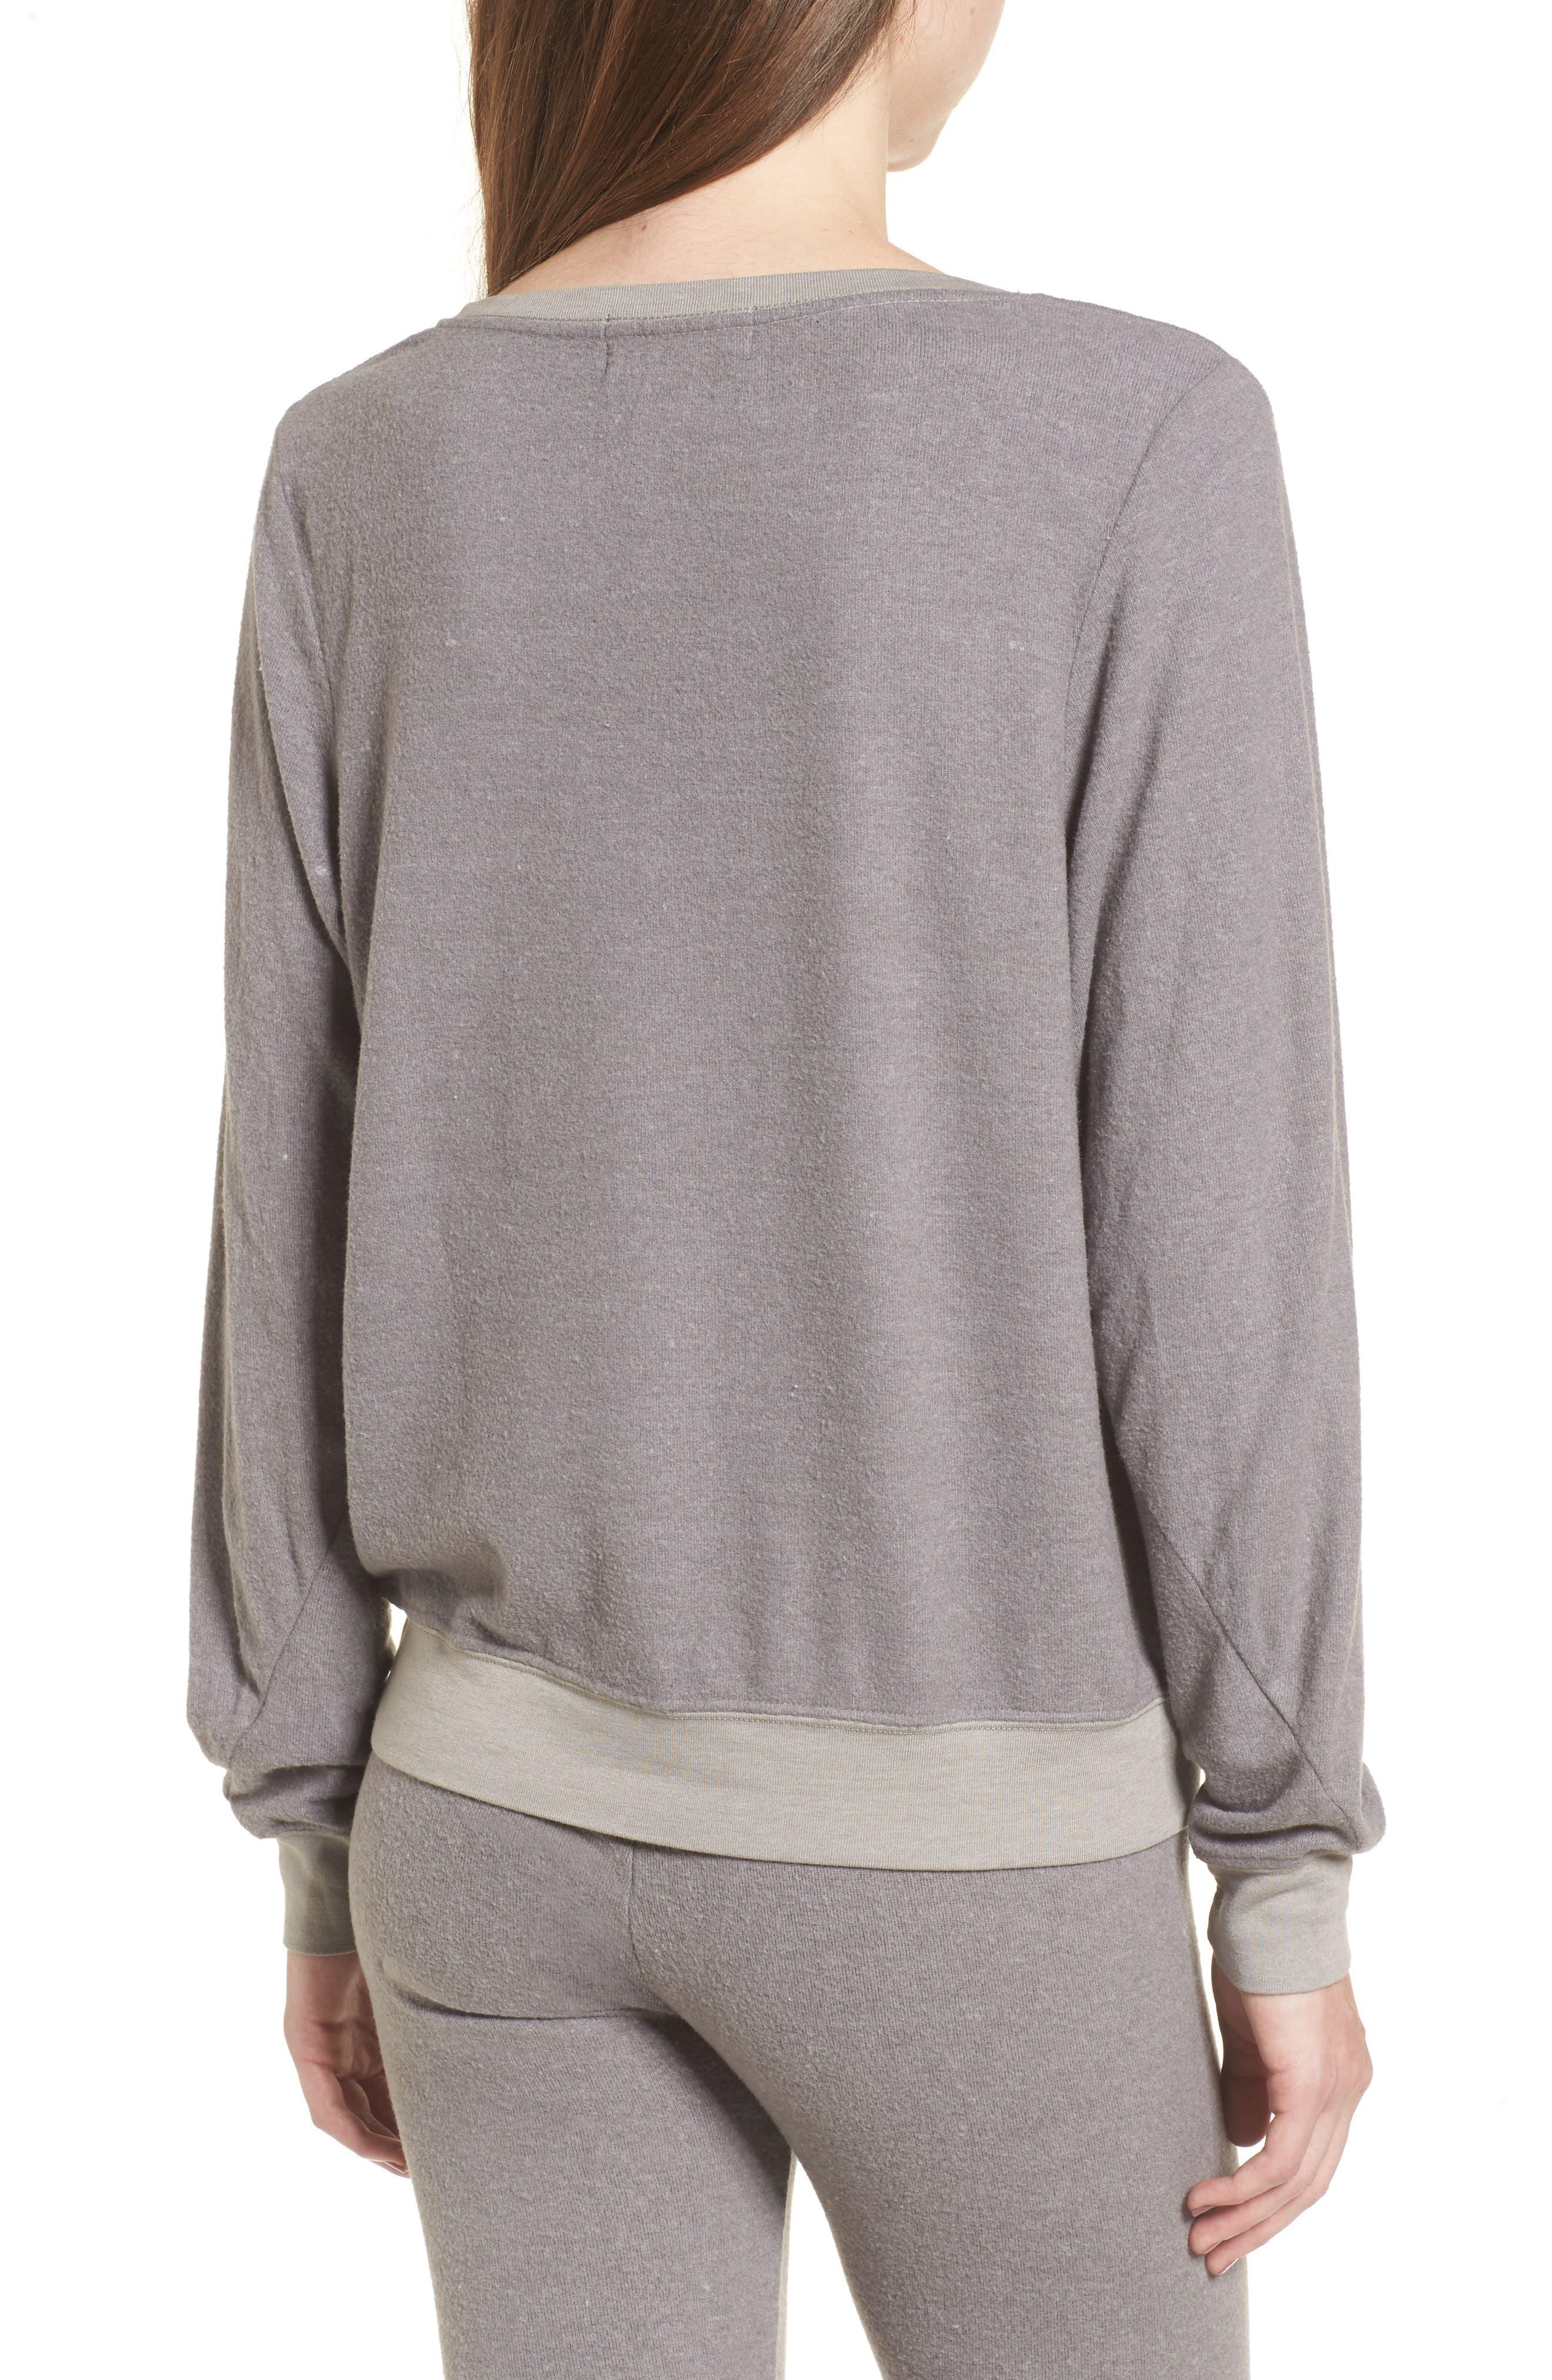 NYC Sweatshirt,                             Alternate thumbnail 2, color,                             Vintage Grey